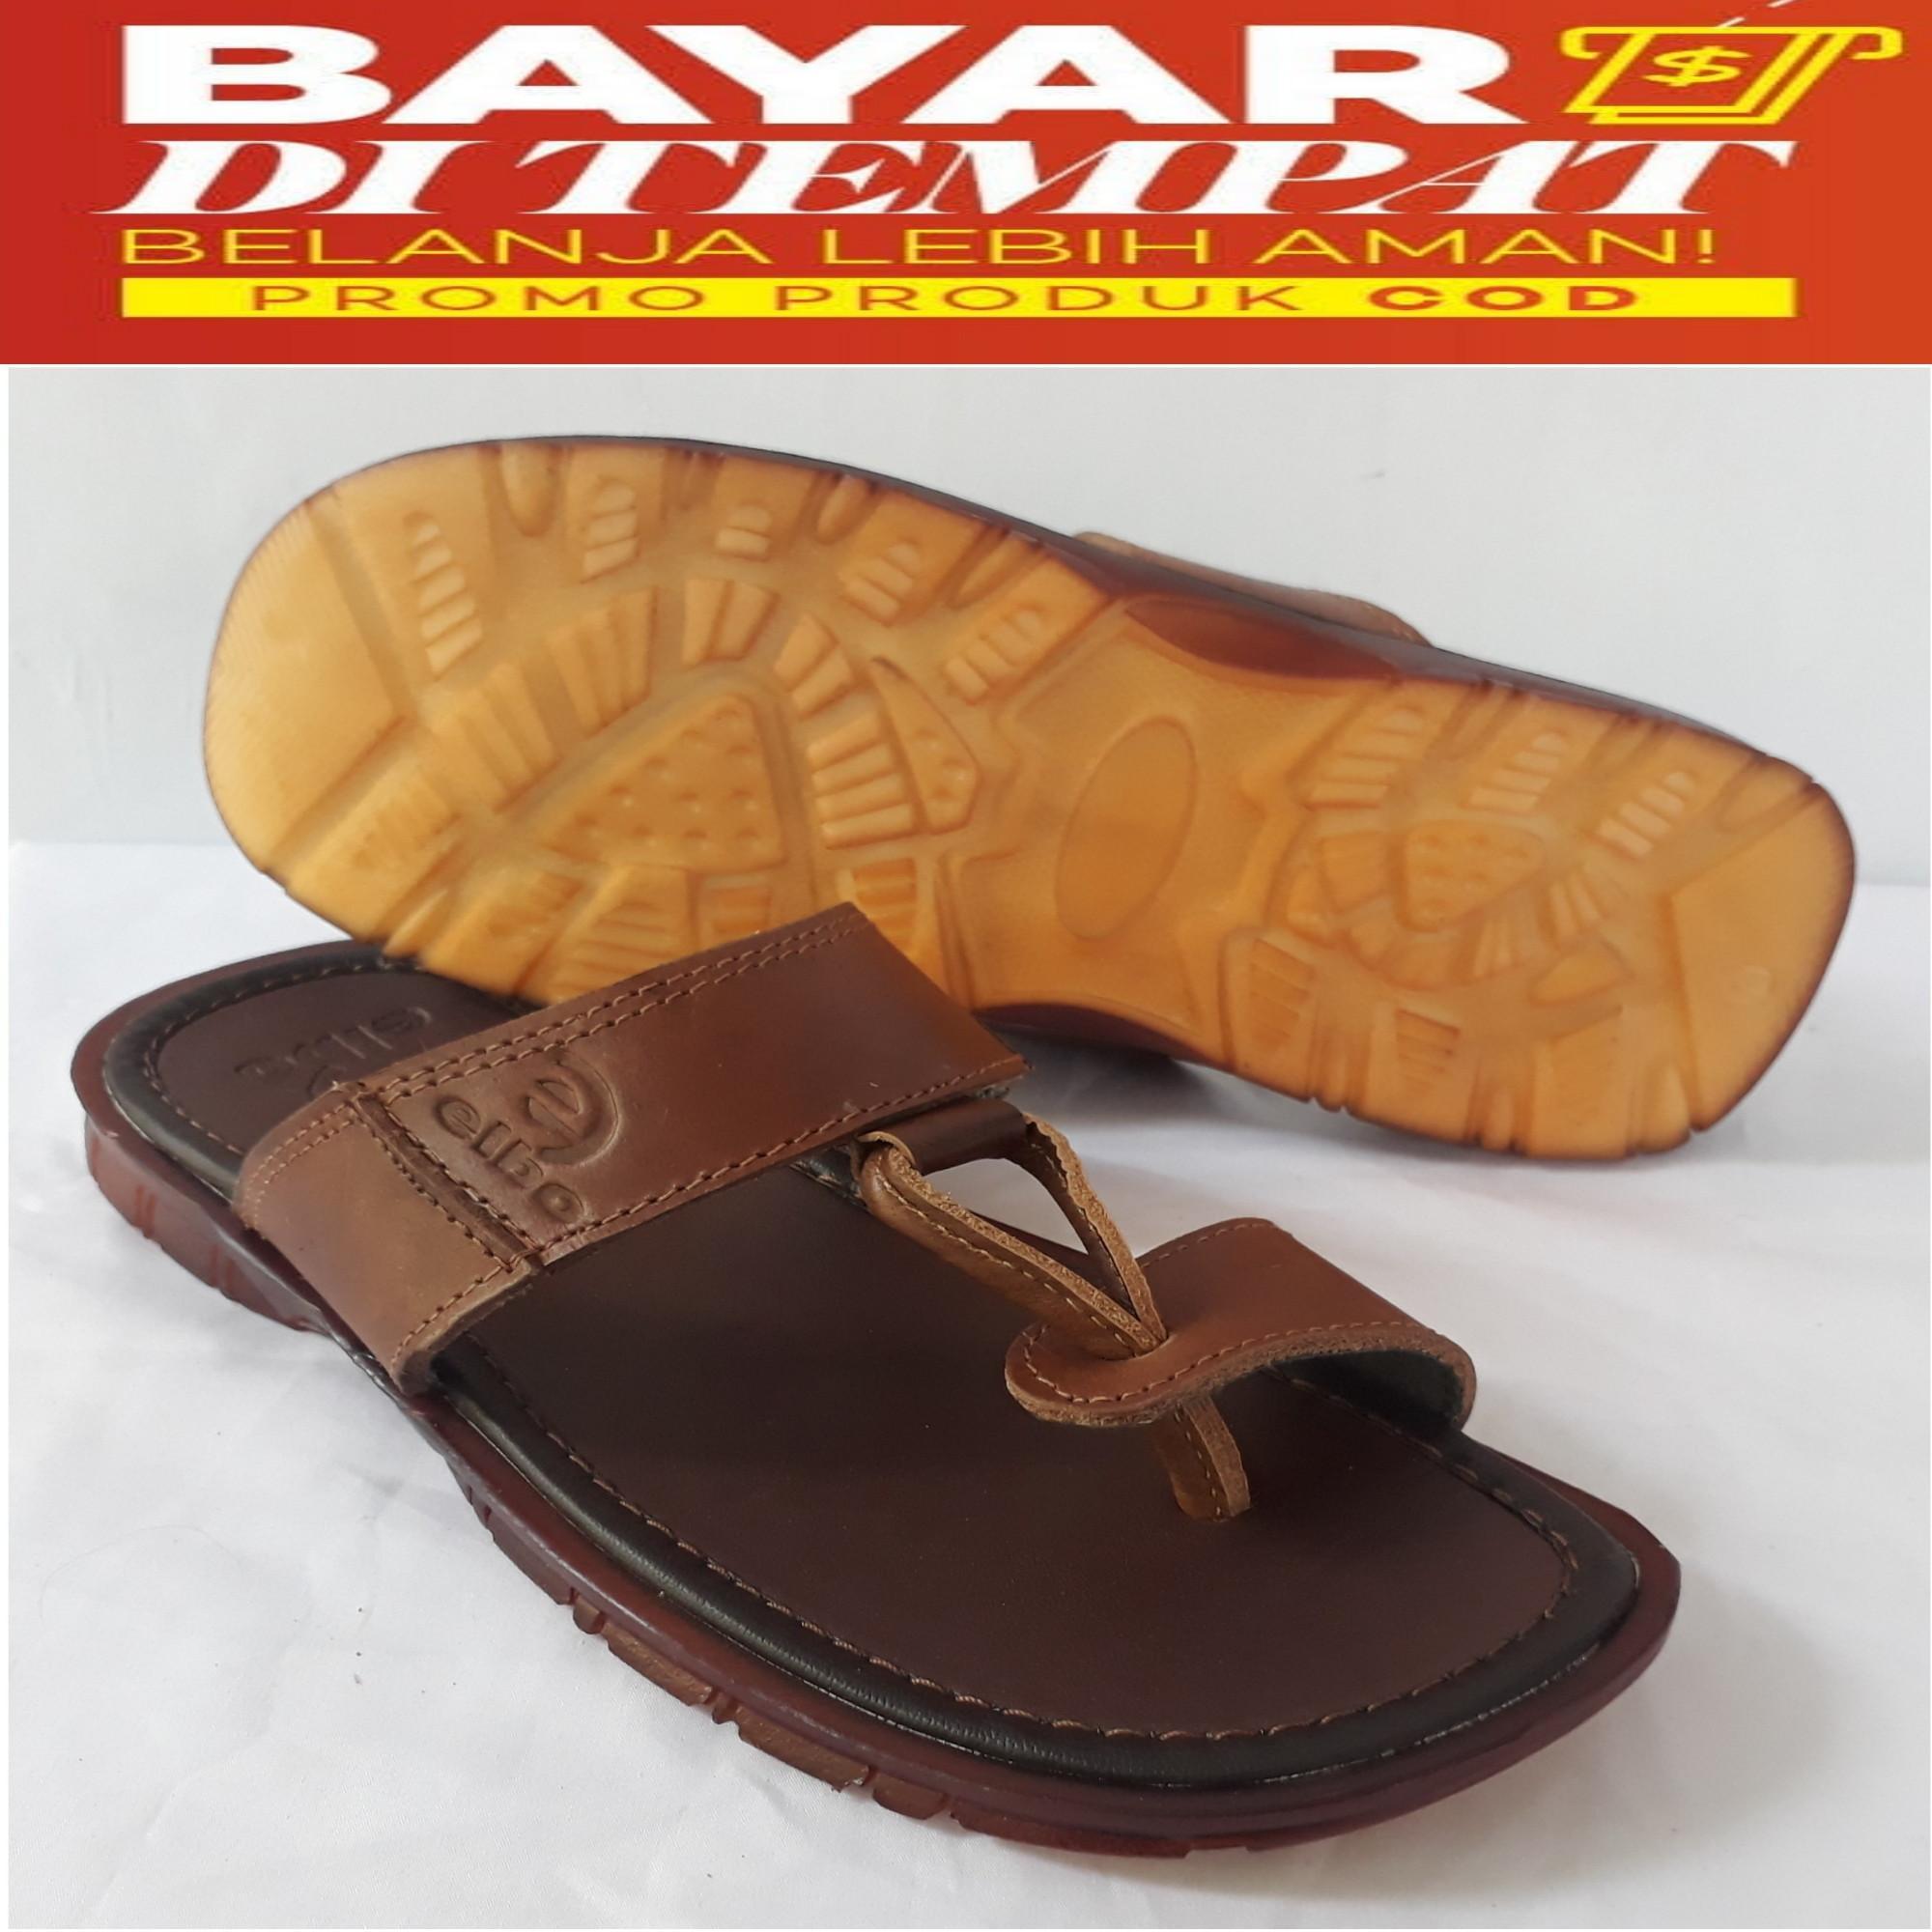 Fashion Sandal Kulit Pria Daftar Harga Wakai Mikkusu Maroon Grey Black Sepatu Slip On Wak0002551zz895 Hitam 36 November 2018